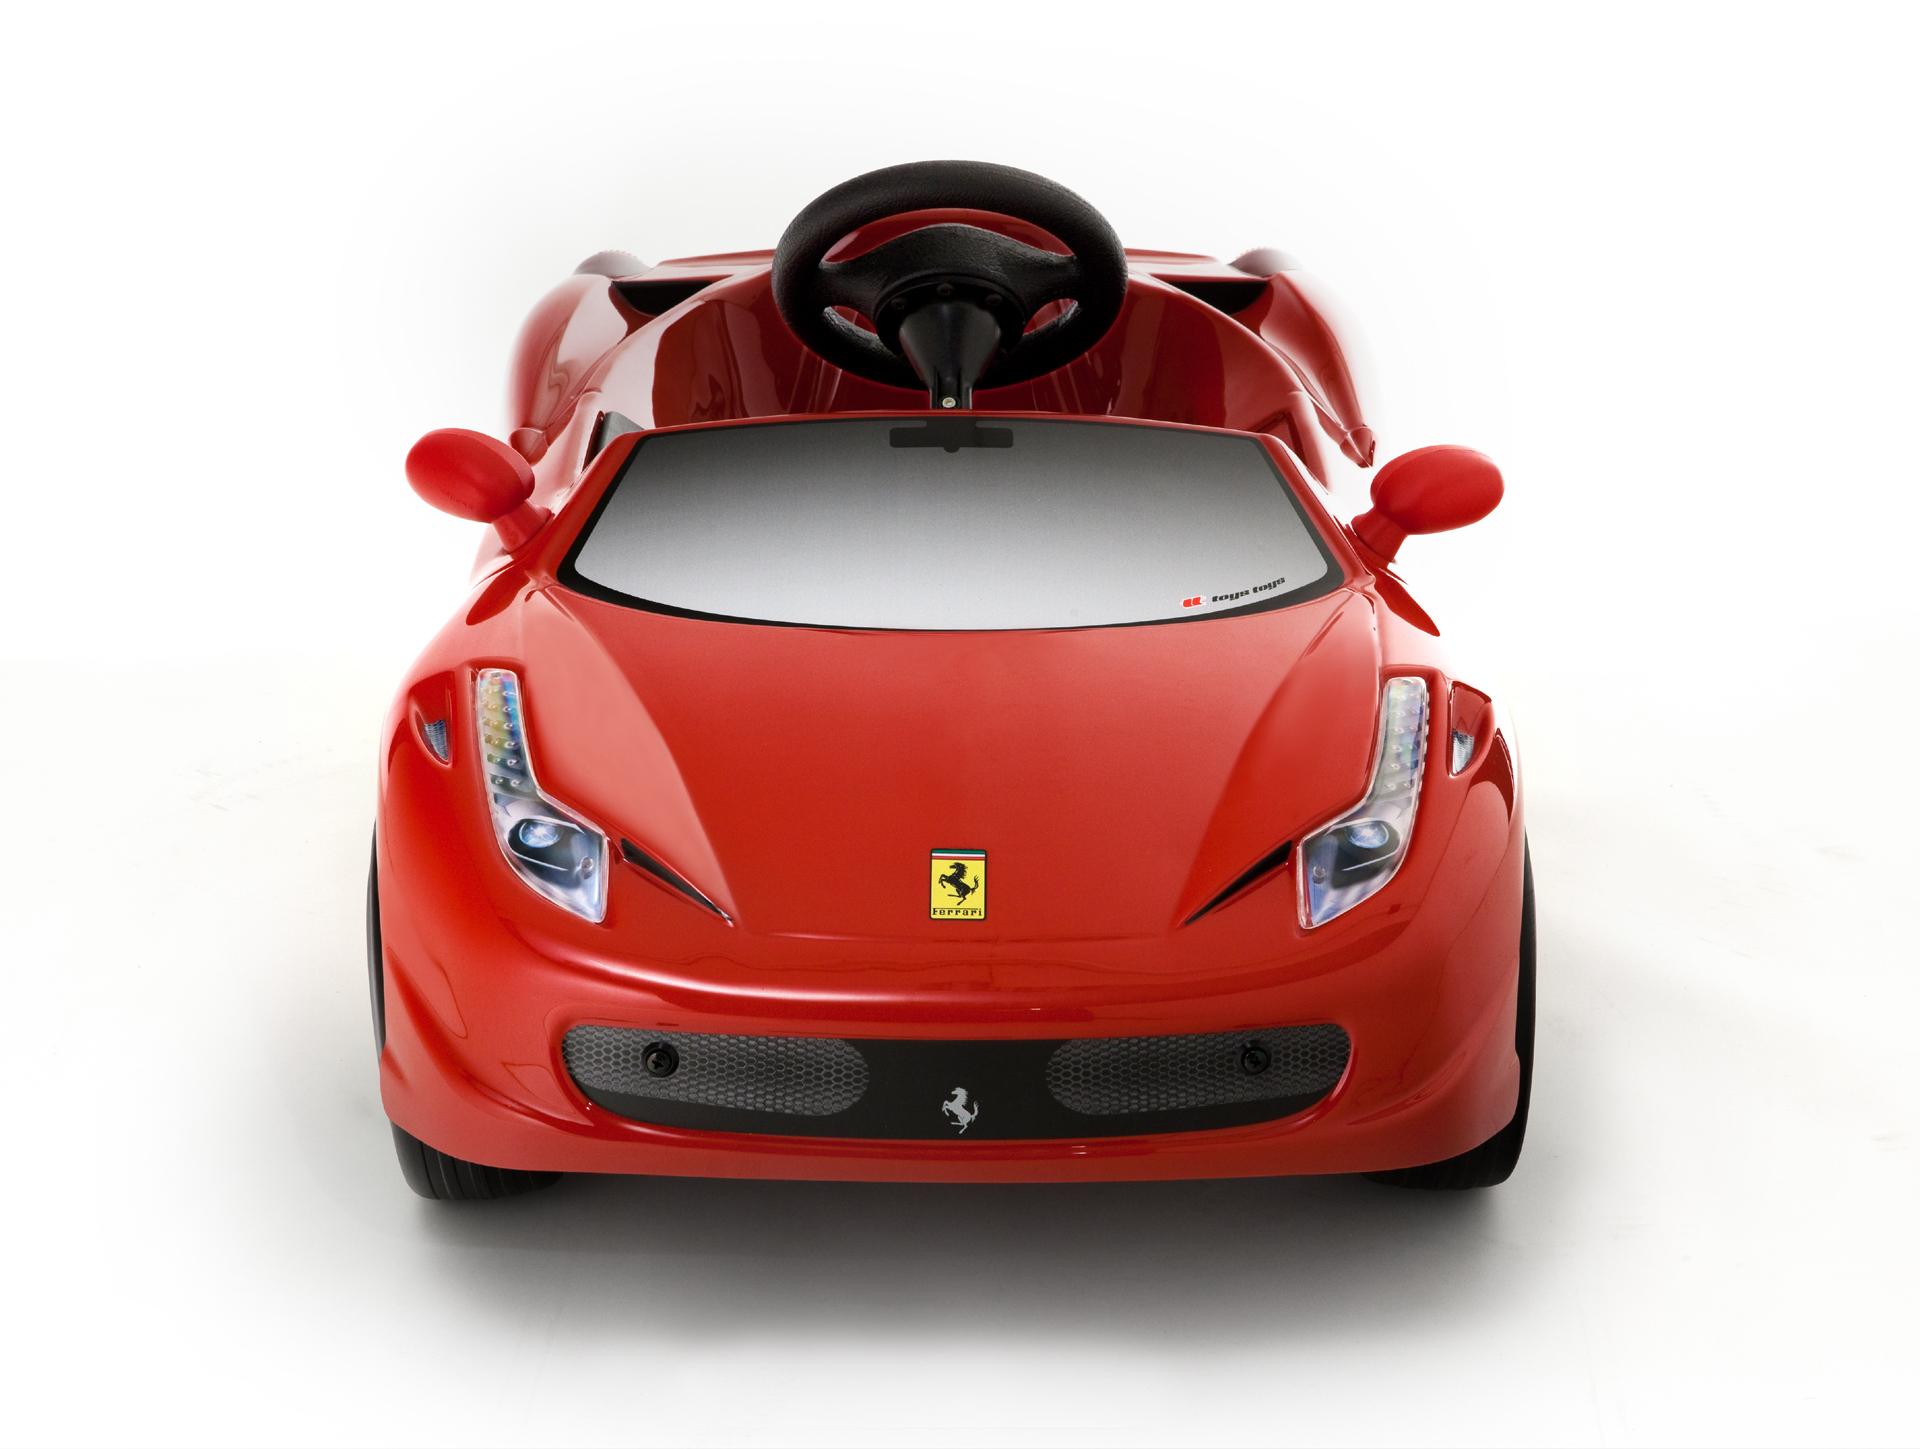 kinder elektroauto toys toys ferrari 458 challenge. Black Bedroom Furniture Sets. Home Design Ideas